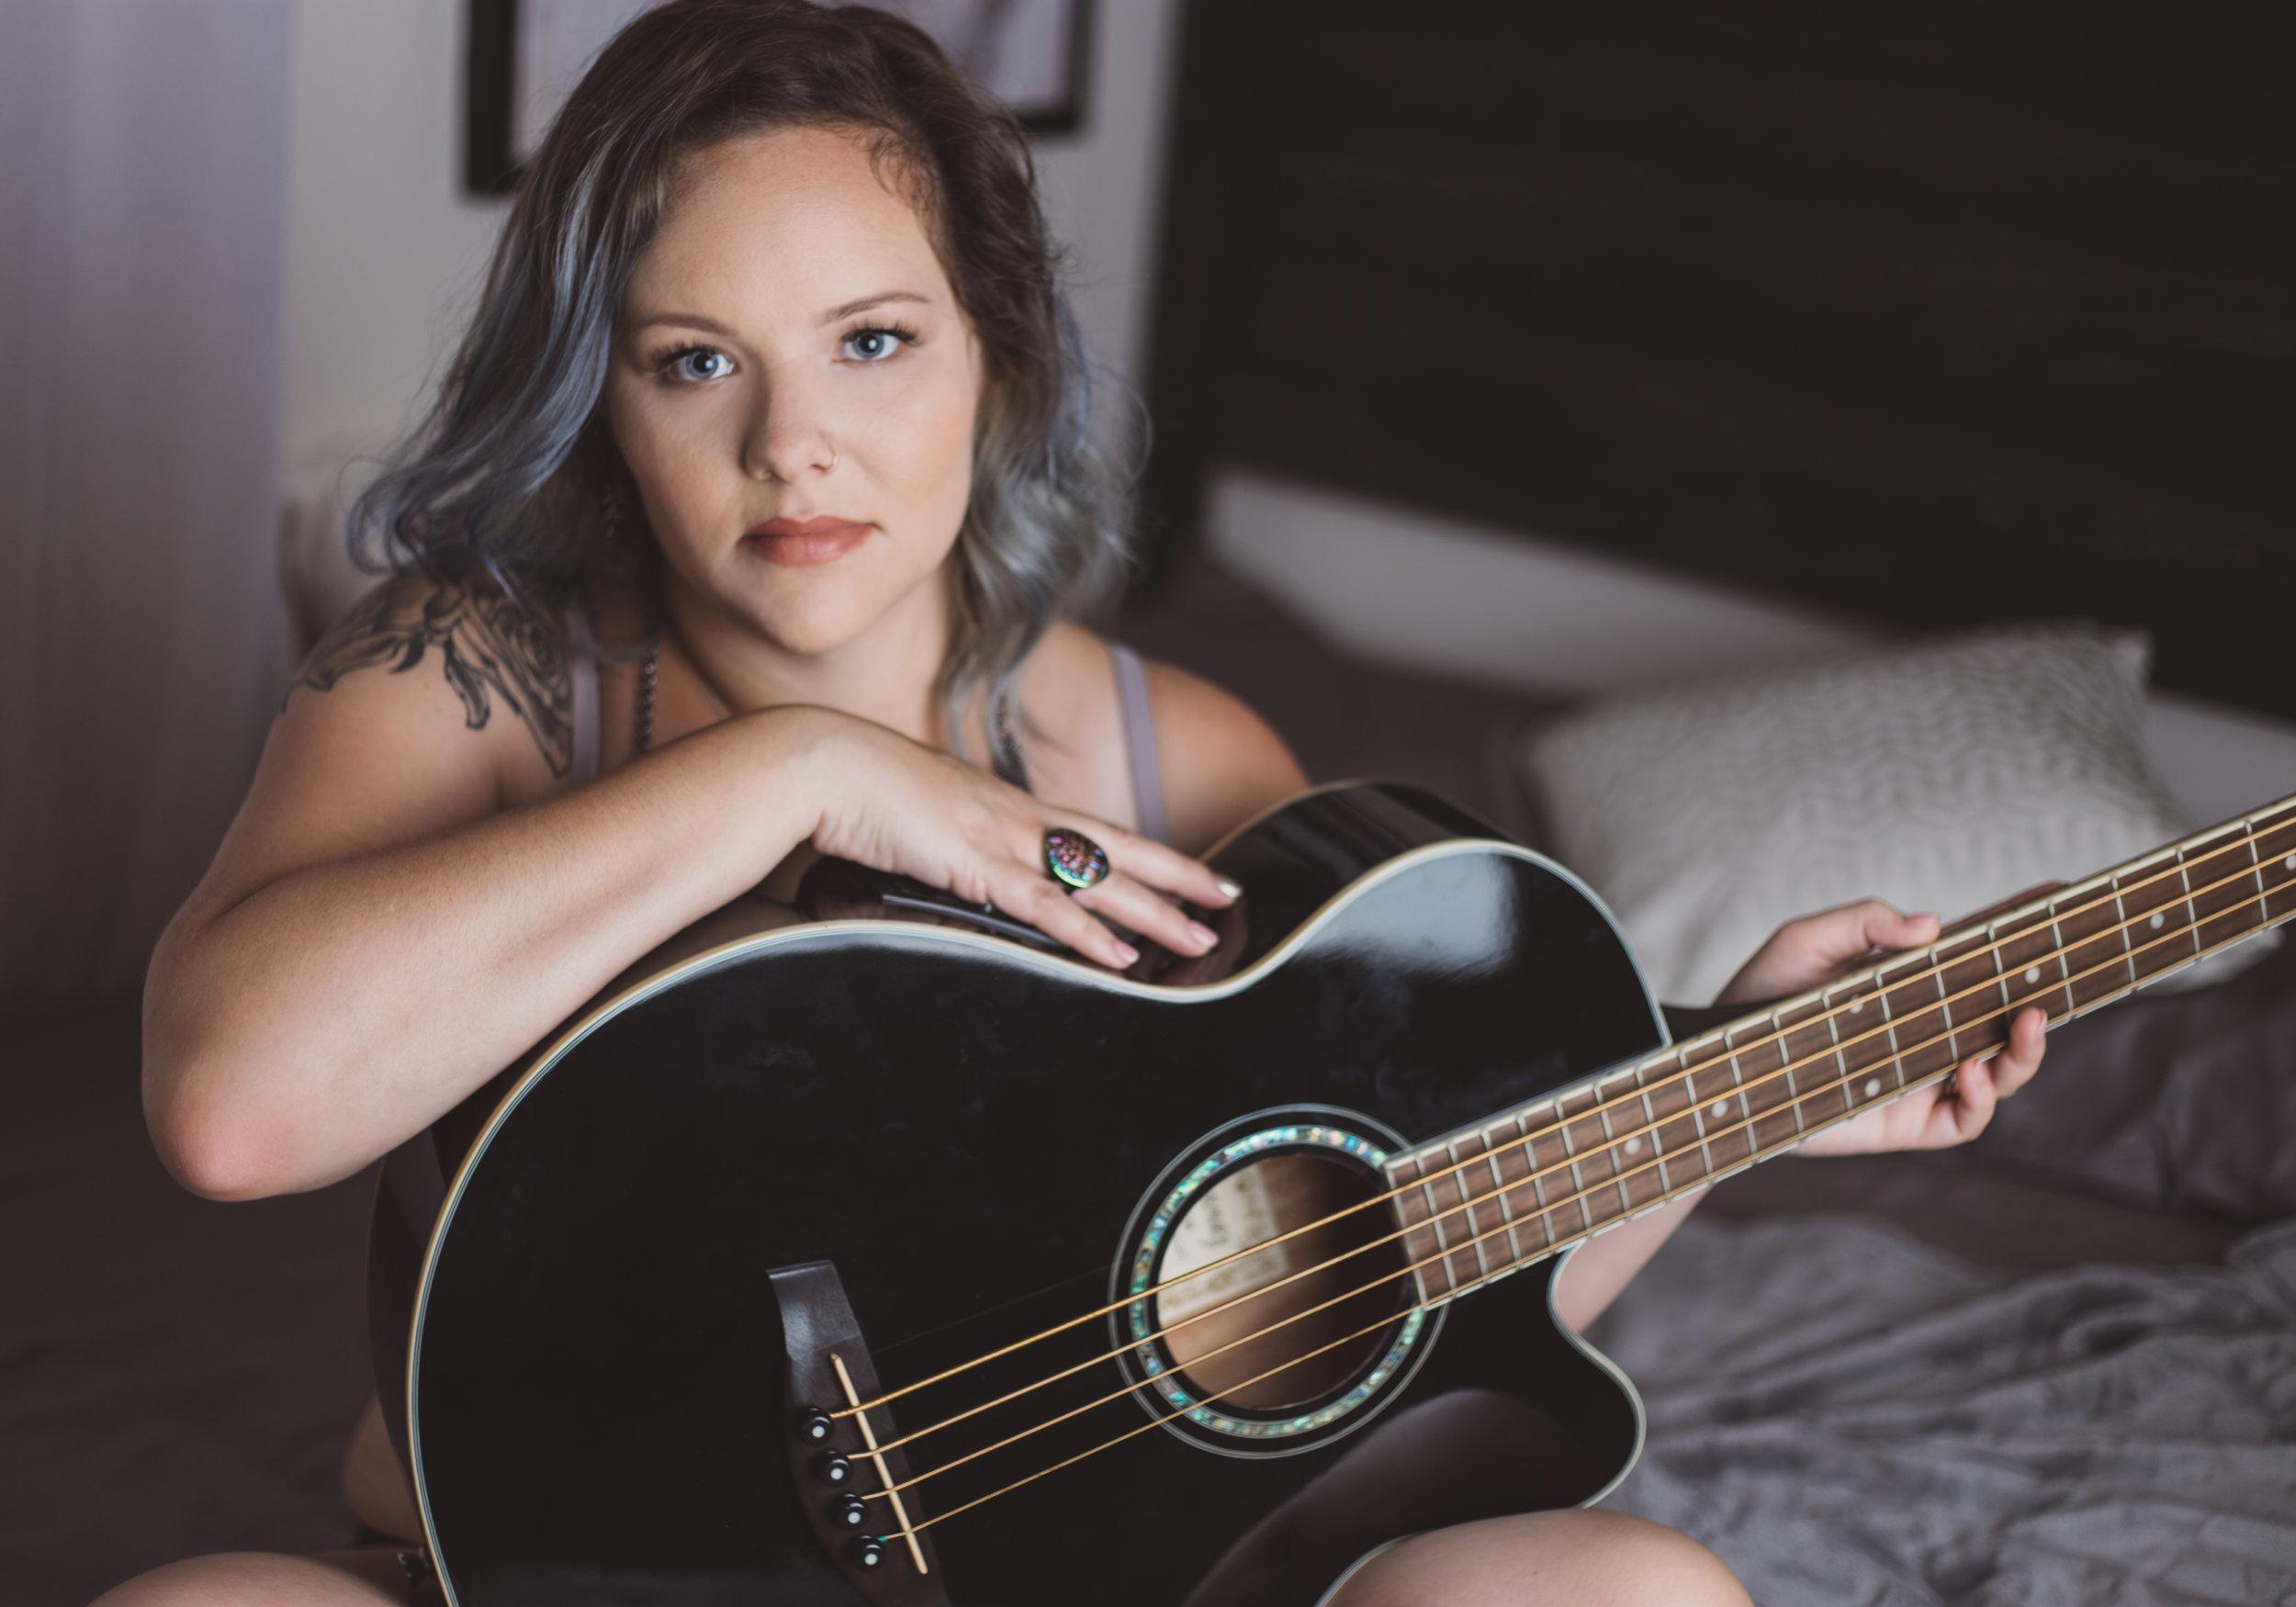 musical-guitar-boudoir-sincerely-you-portraits-lake-jackson-texas